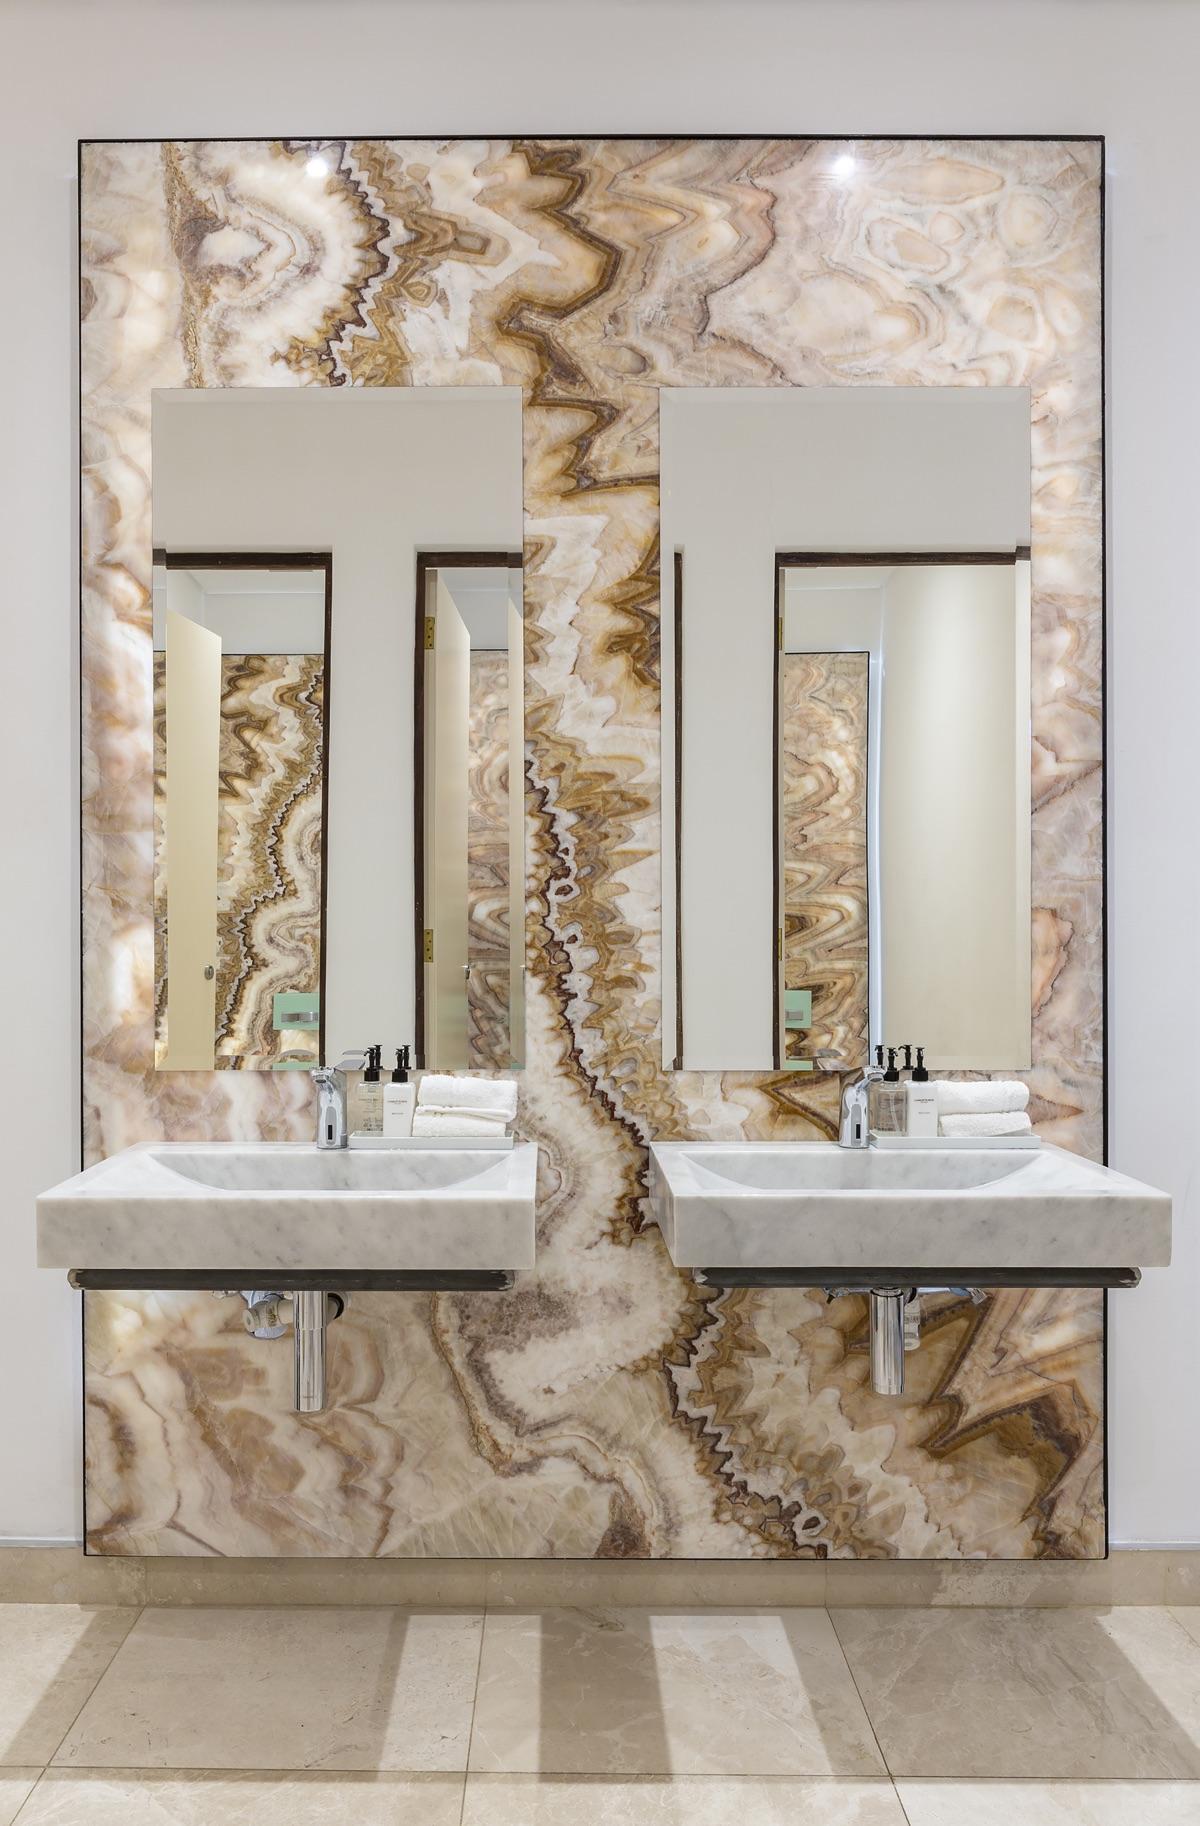 Artmar-MARBLE-SLABS_COMMERCIAL-PROJECT_Lanzerac-Hotel_Honey-Rainbow-Onyx-Feature-wall_-Supply-Fit-with-Crema-Marfil-Marble-floors-Custom-Mugla-Marble-Basins-1.jpg